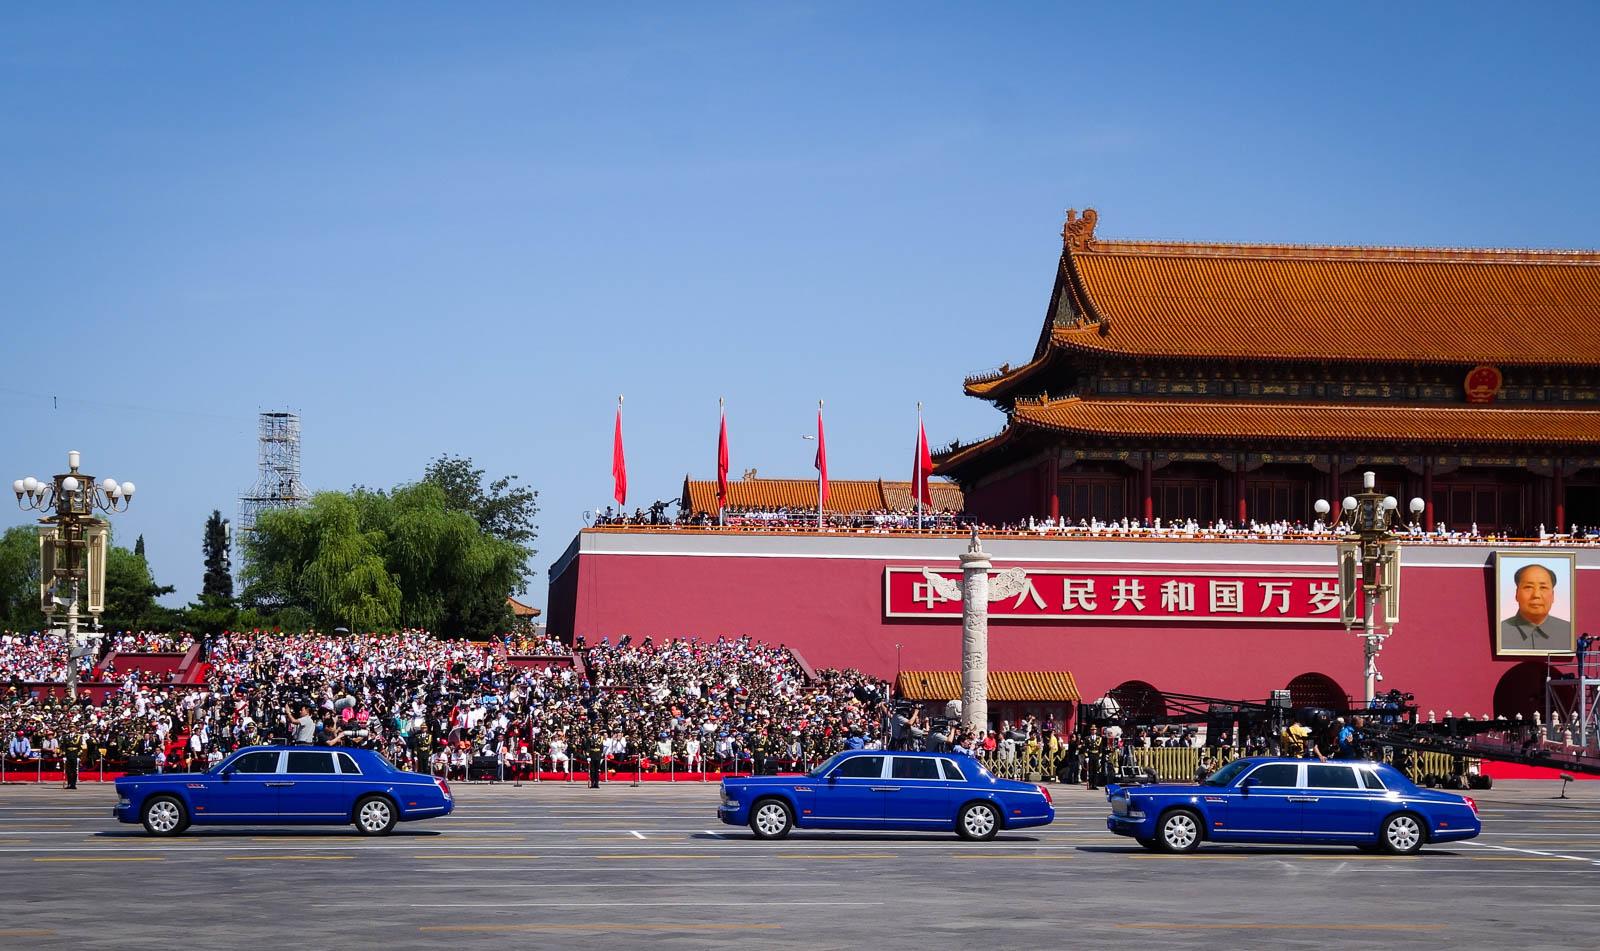 beijing-china-military-parade-2015-15